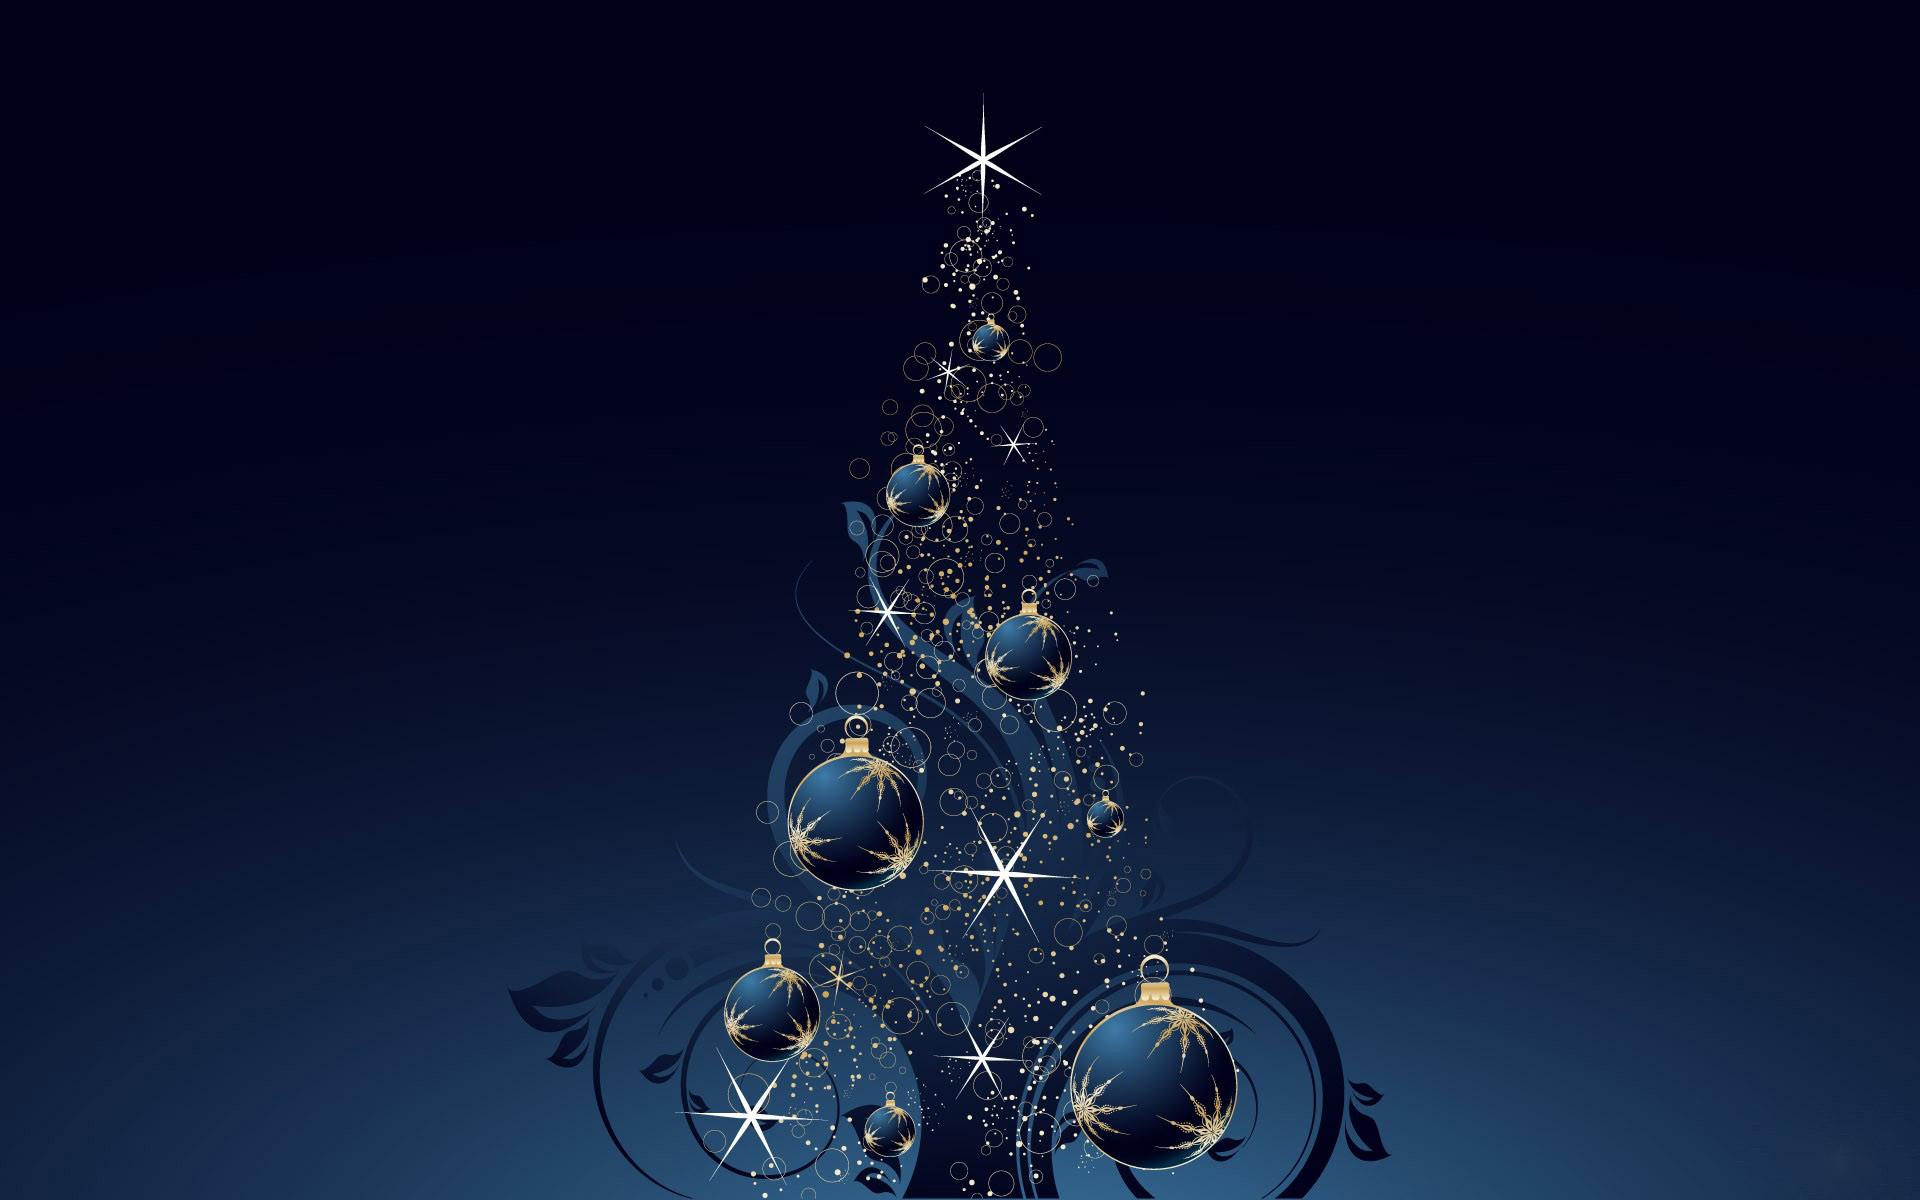 Christmas Tree Windows 7 High Quality WallpapersWallpaper Desktop 1920x1200